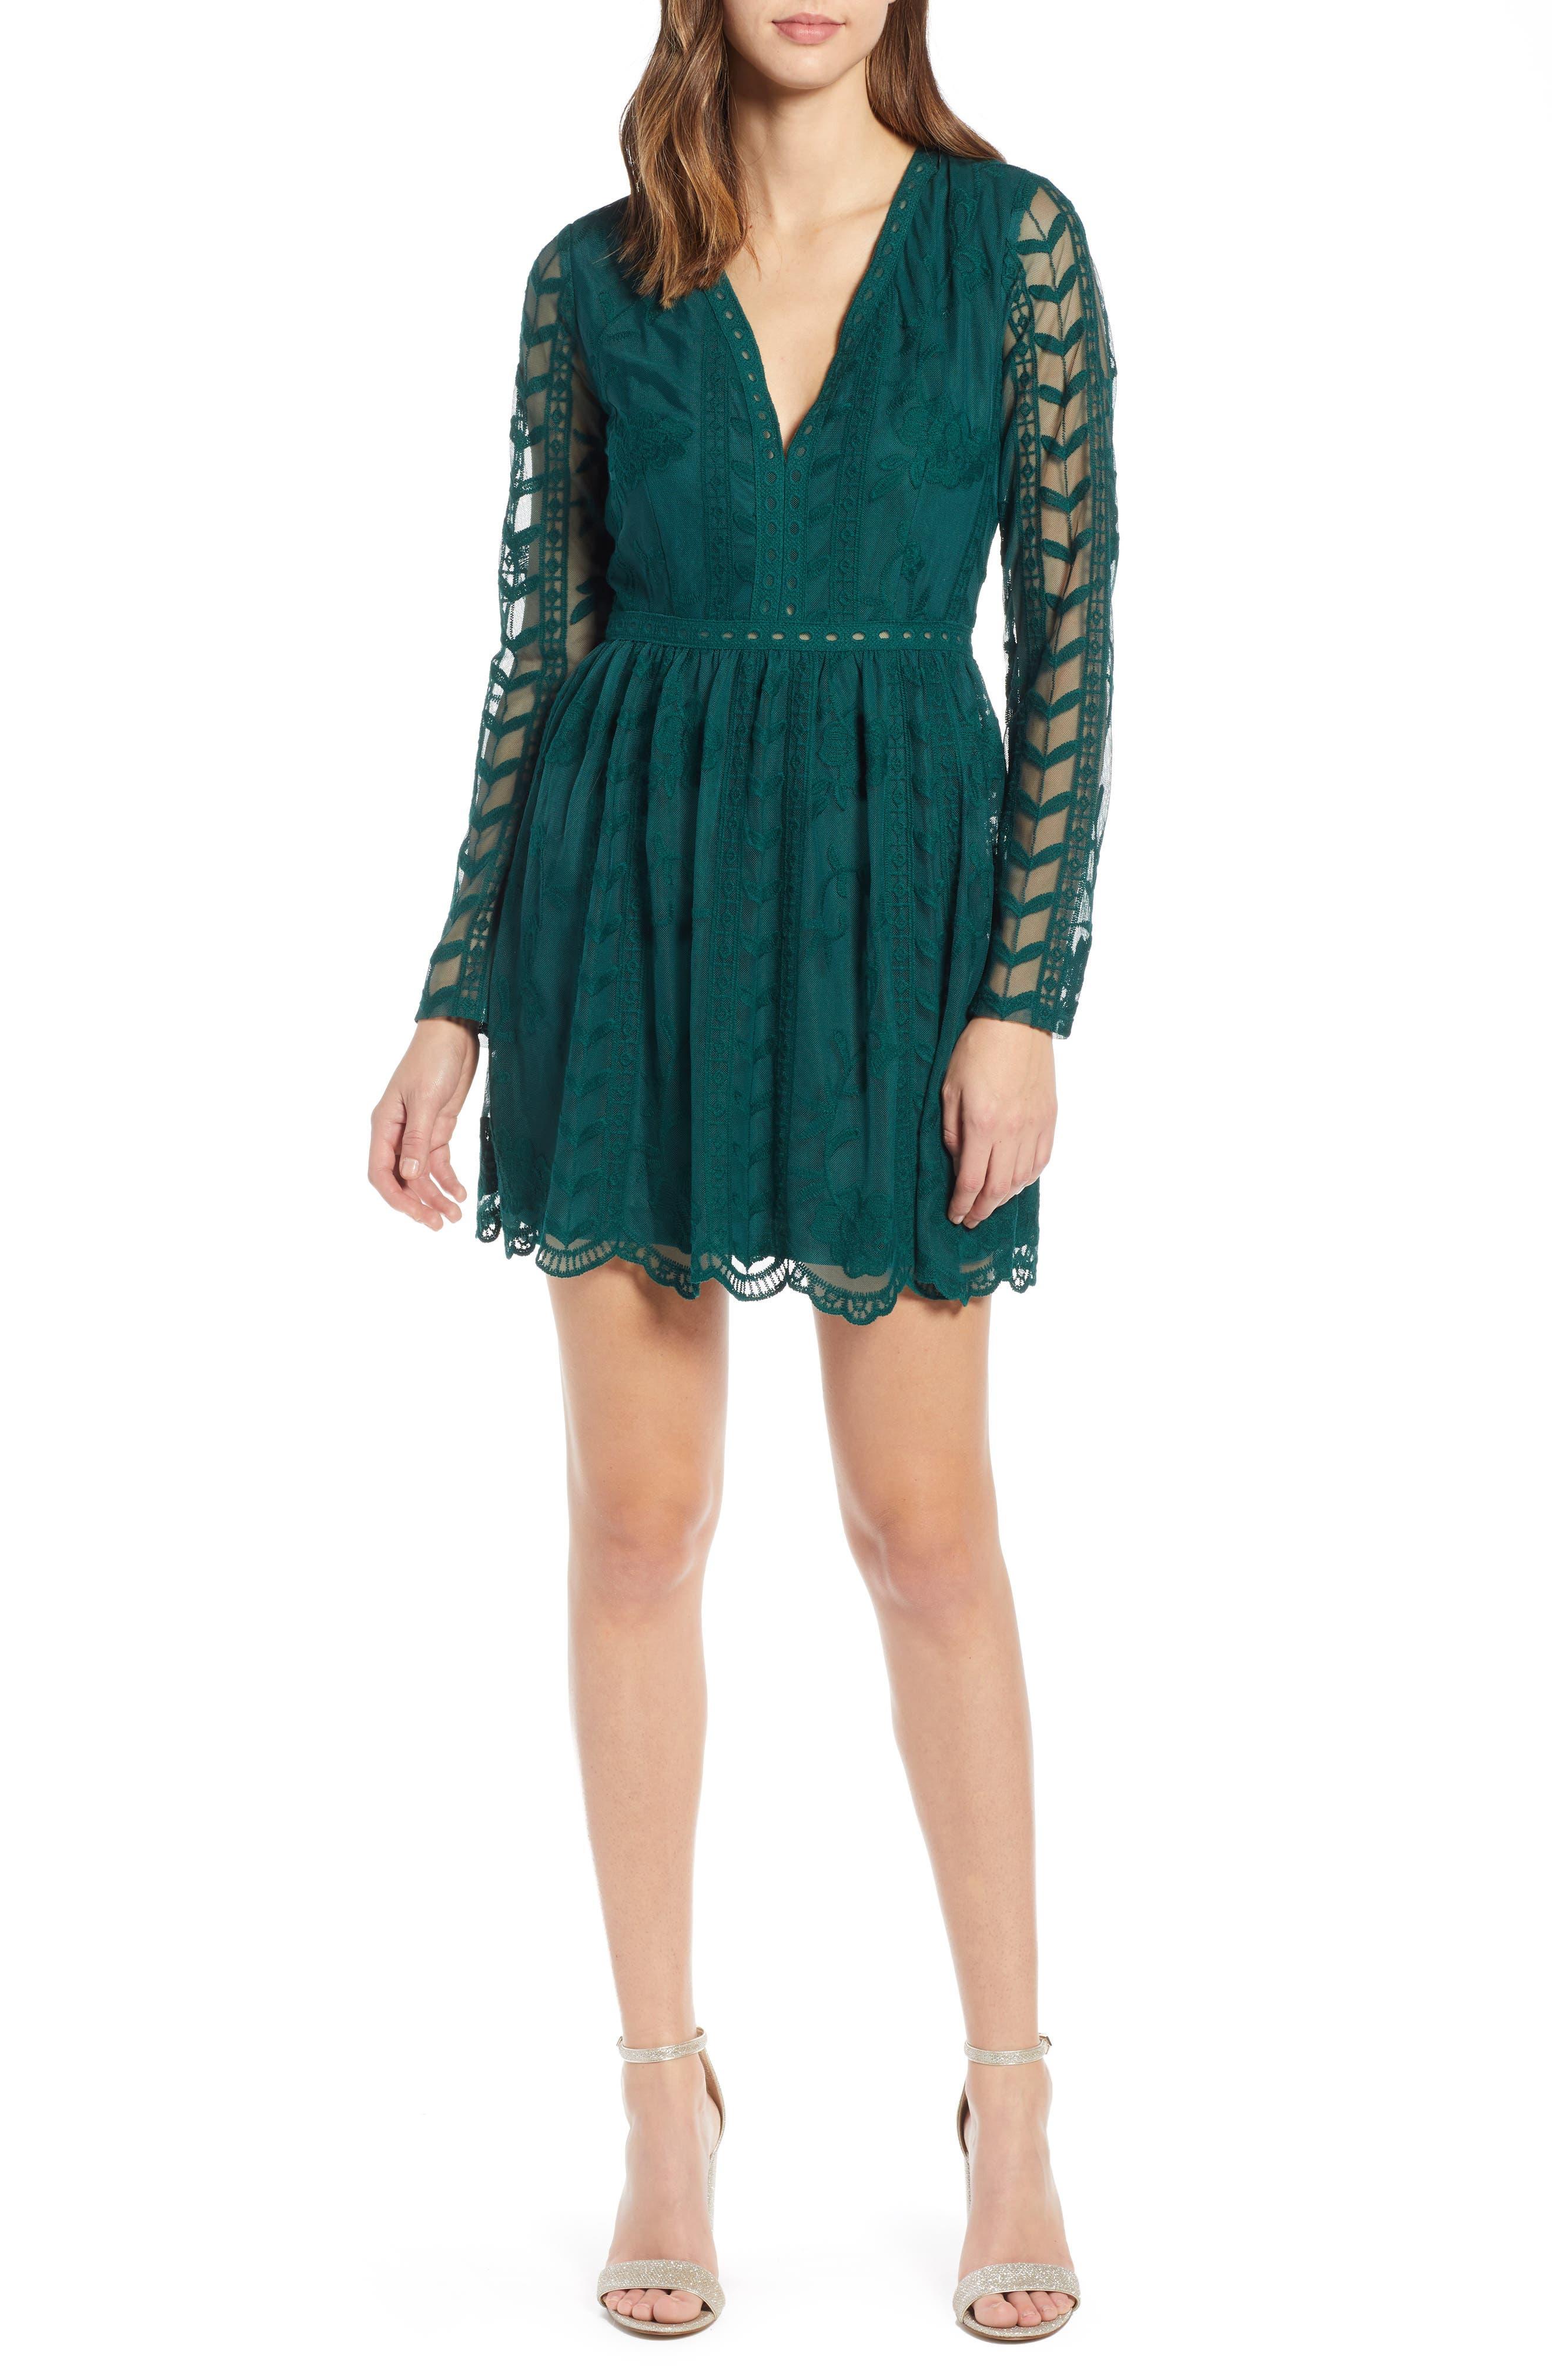 SOCIALITE Long Sleeve V-Neck Lace Dress, Main, color, 300